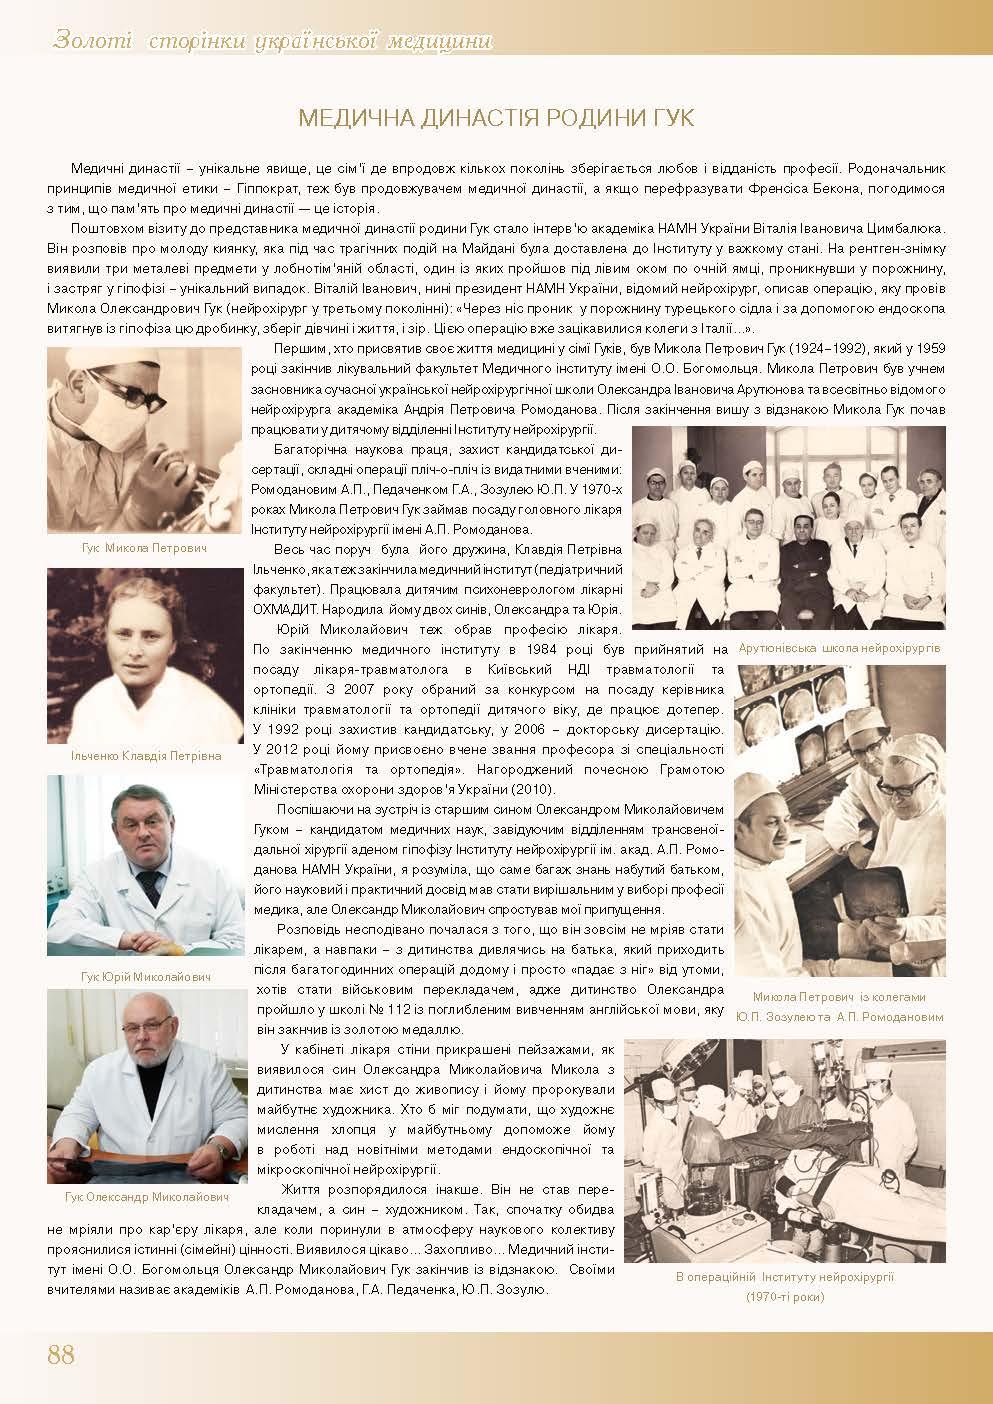 Медична династія родини Гук